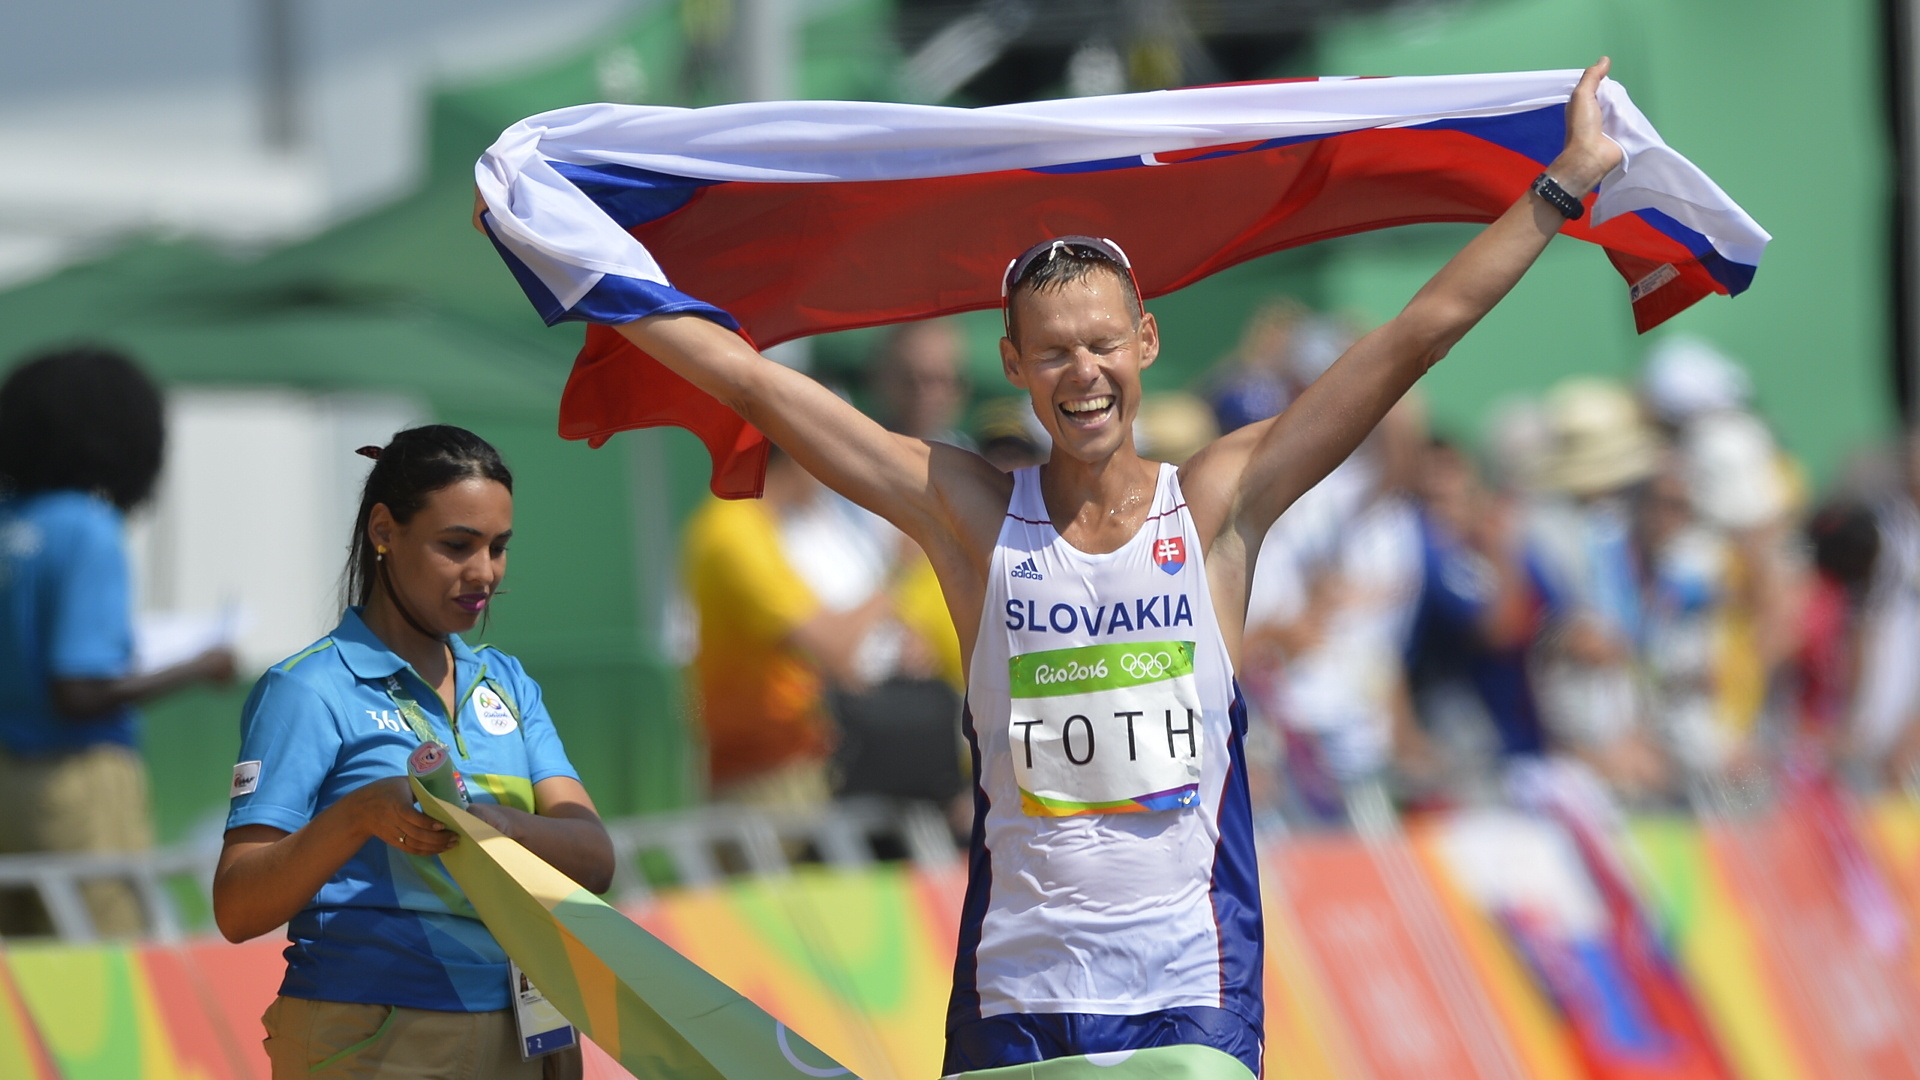 Tóth zlatý v chôdzi na 50 km, Majdán 26